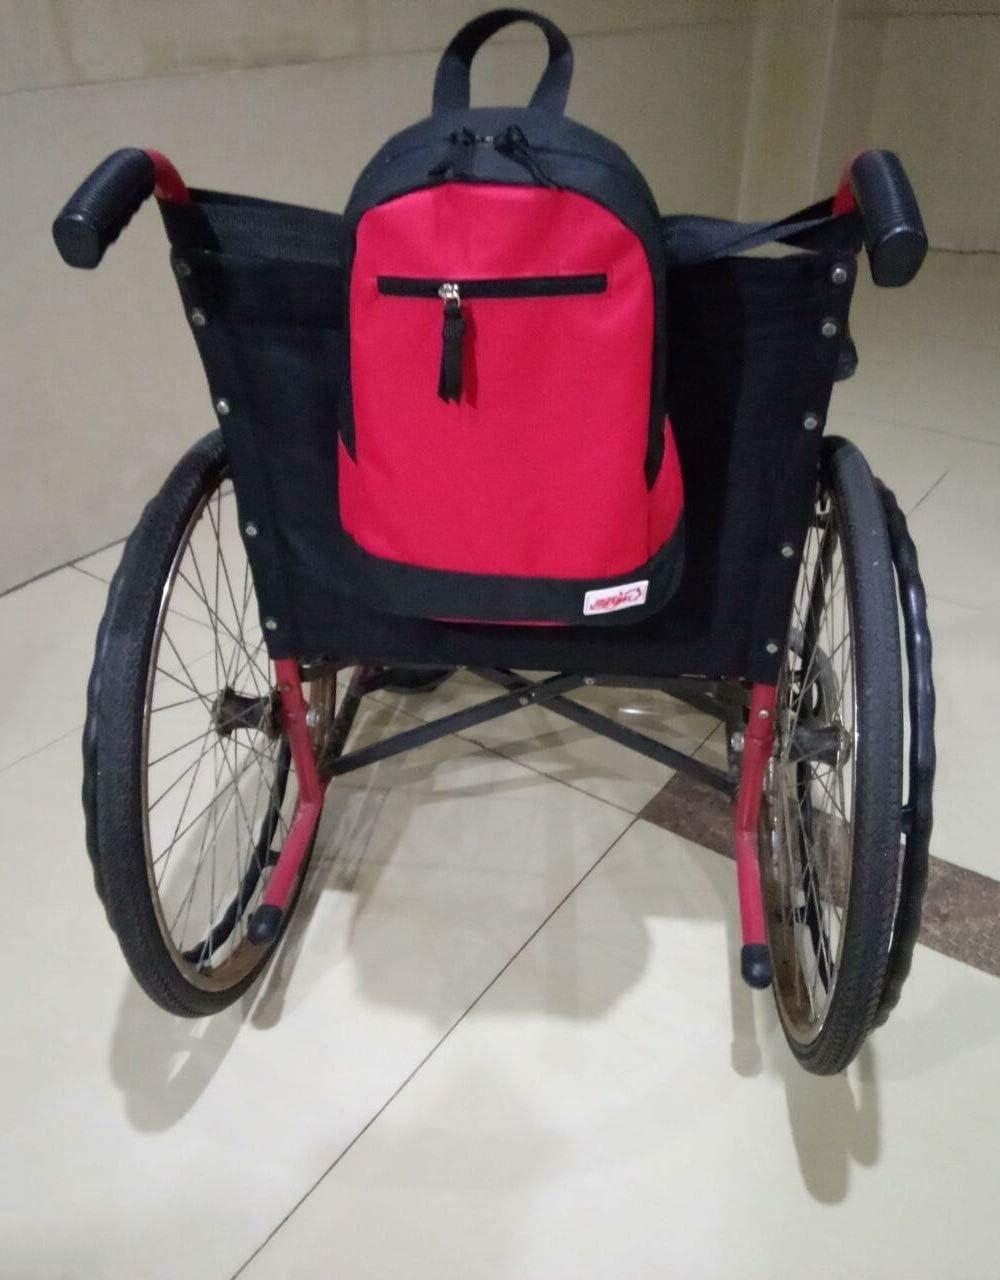 ZHITENG Bolsa para silla de ruedas: bolsa de almacenamiento para transportar artículos; Accesorios - Mochila para si